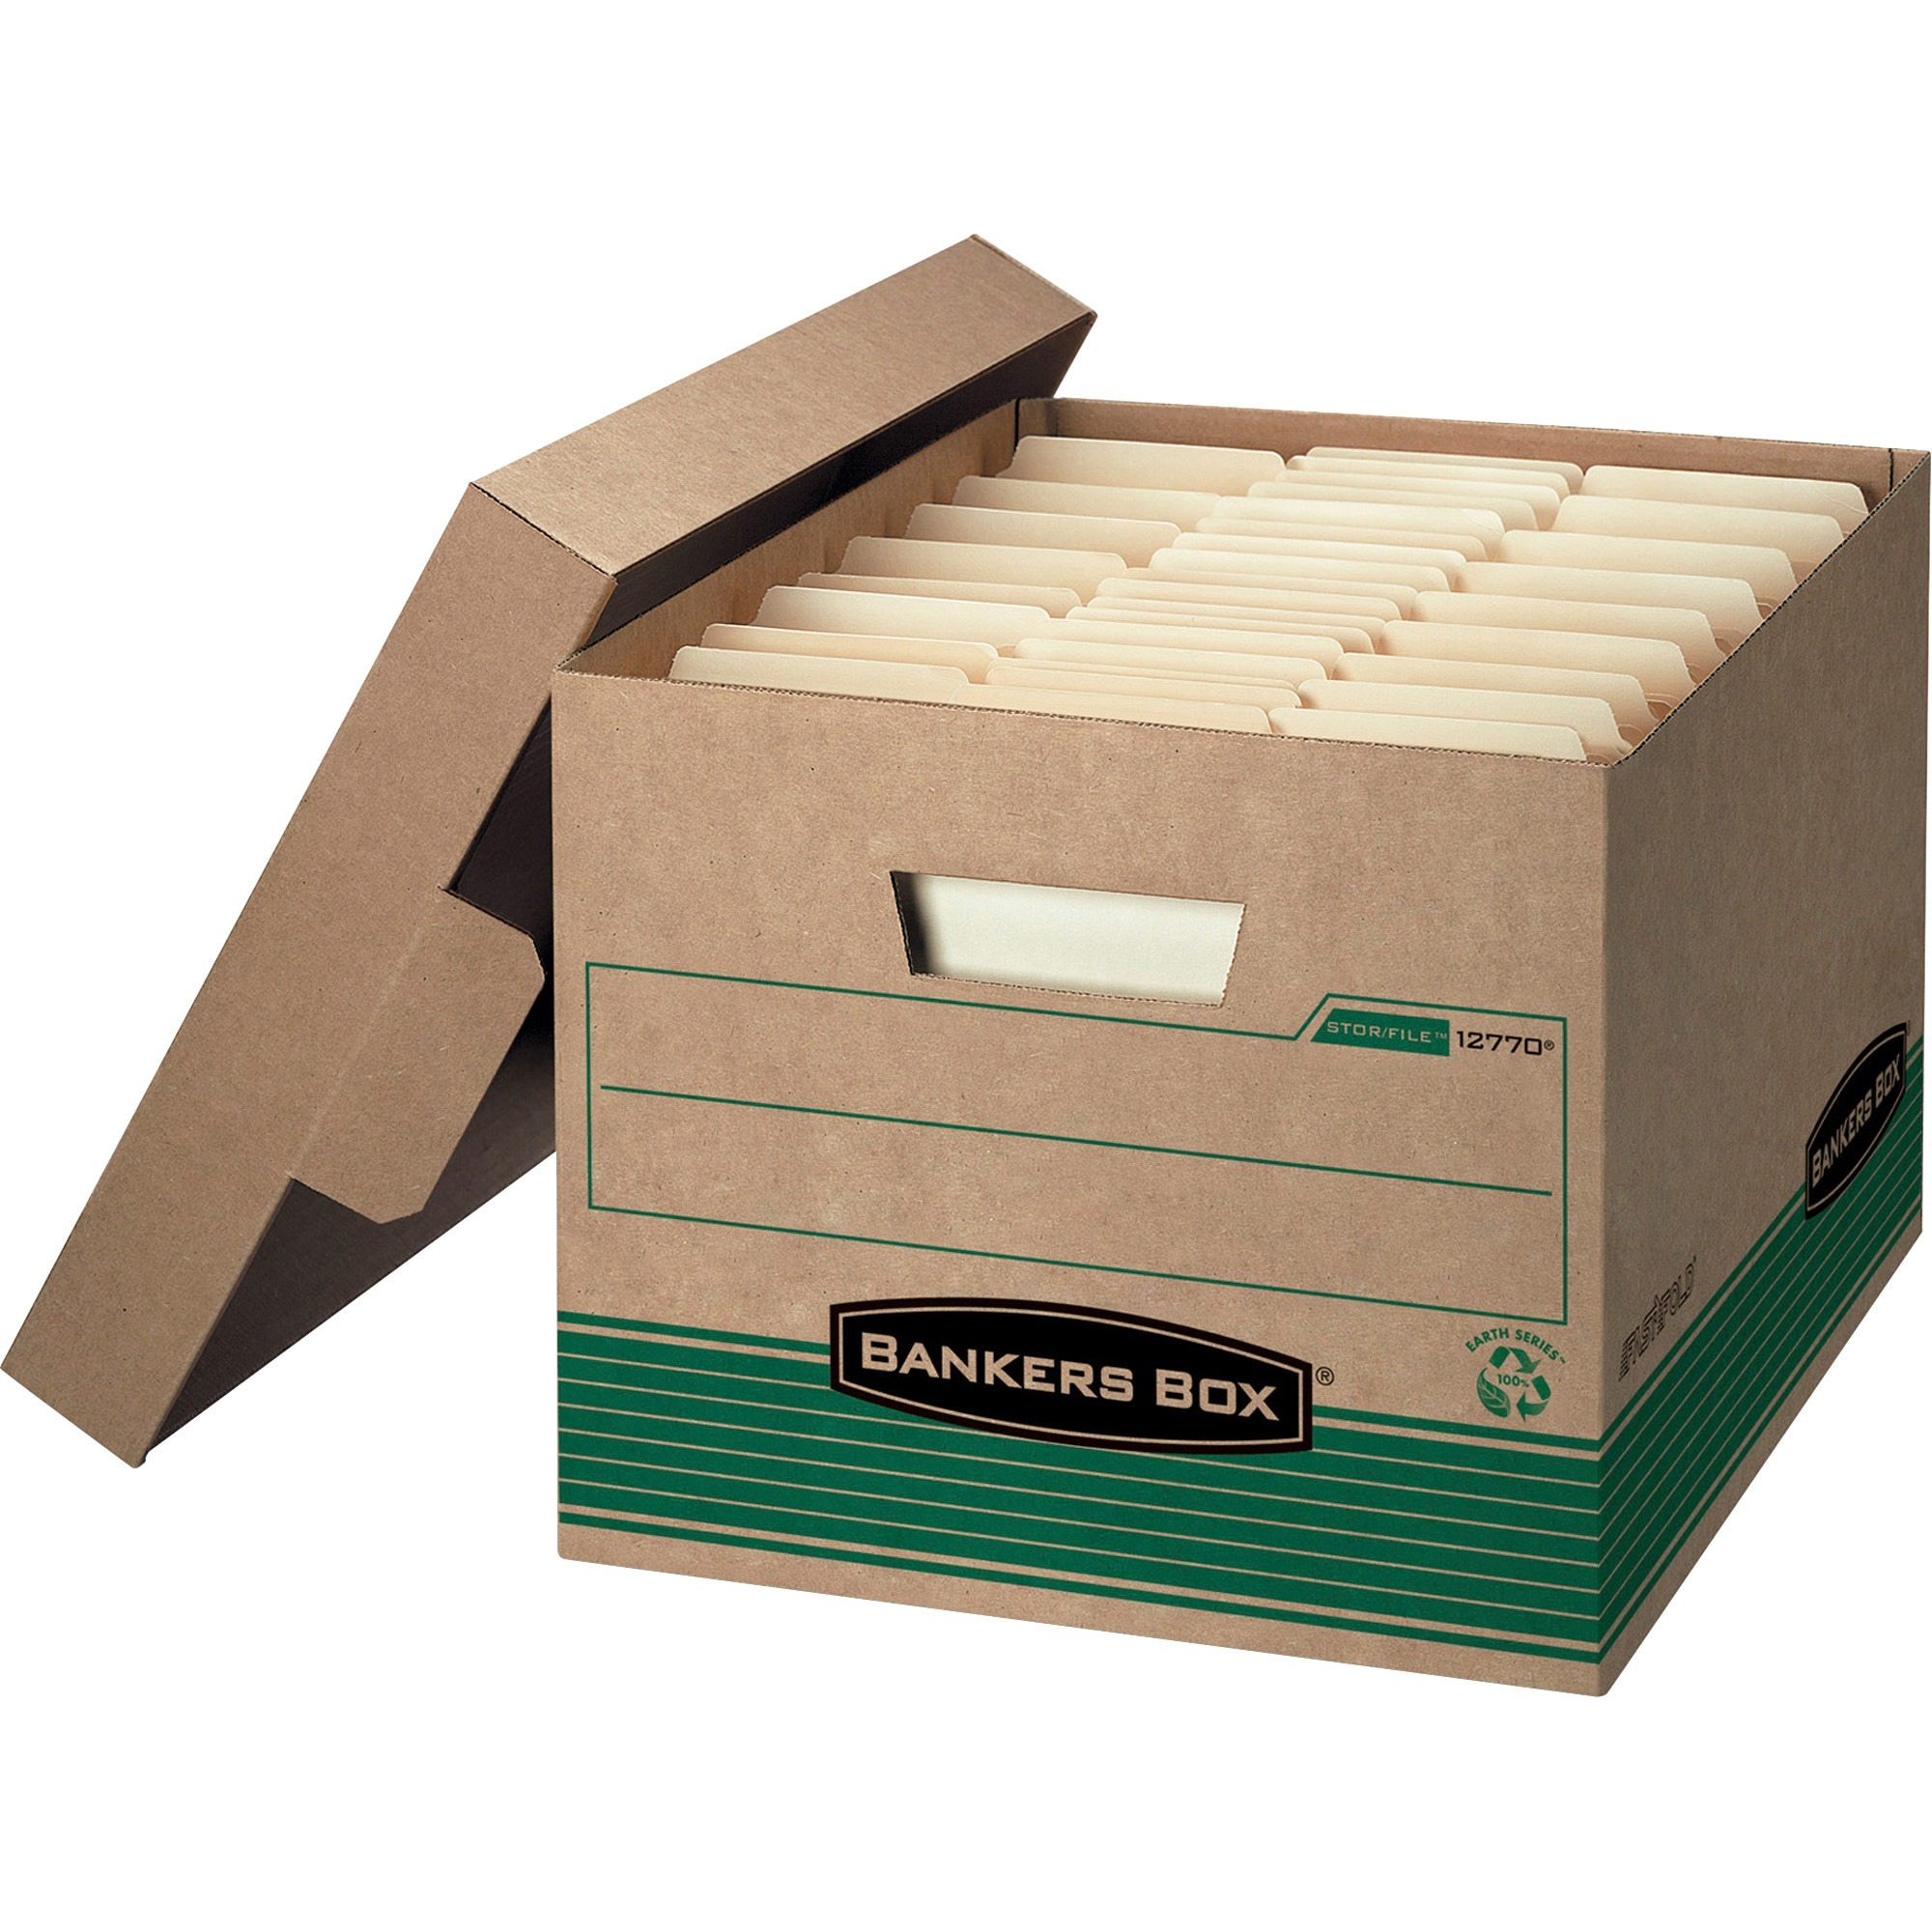 Bankers Box, FEL12770, Medium Letter/Legal Storage Boxes, 12 / Carton, White,Blue